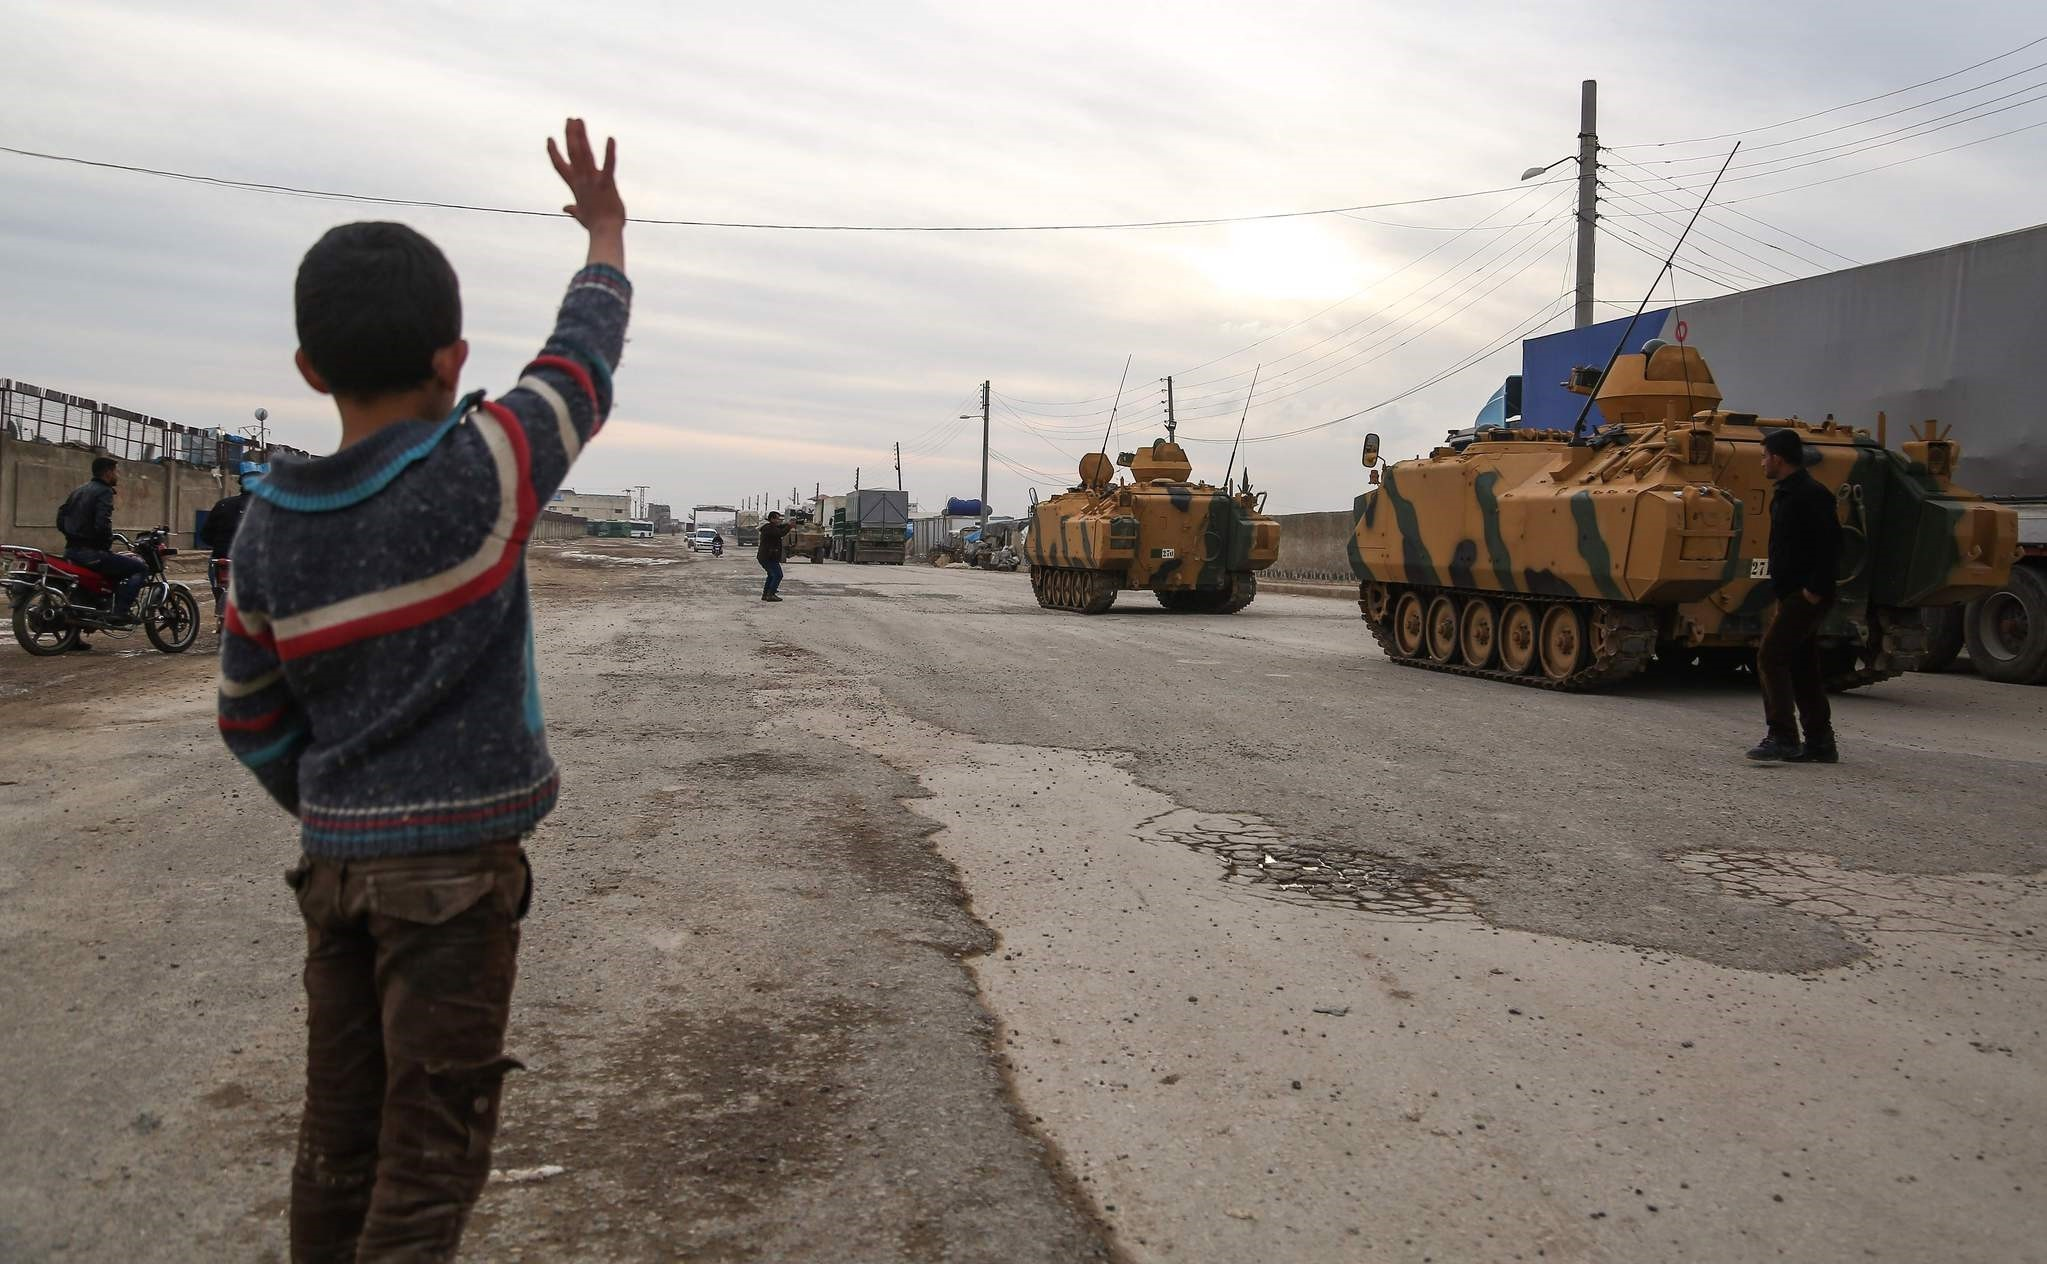 A boy waves at Turkish armoured vehicles passing through the Bab al-Salamah border crossing between Turkey and Syira, Jan. 21.